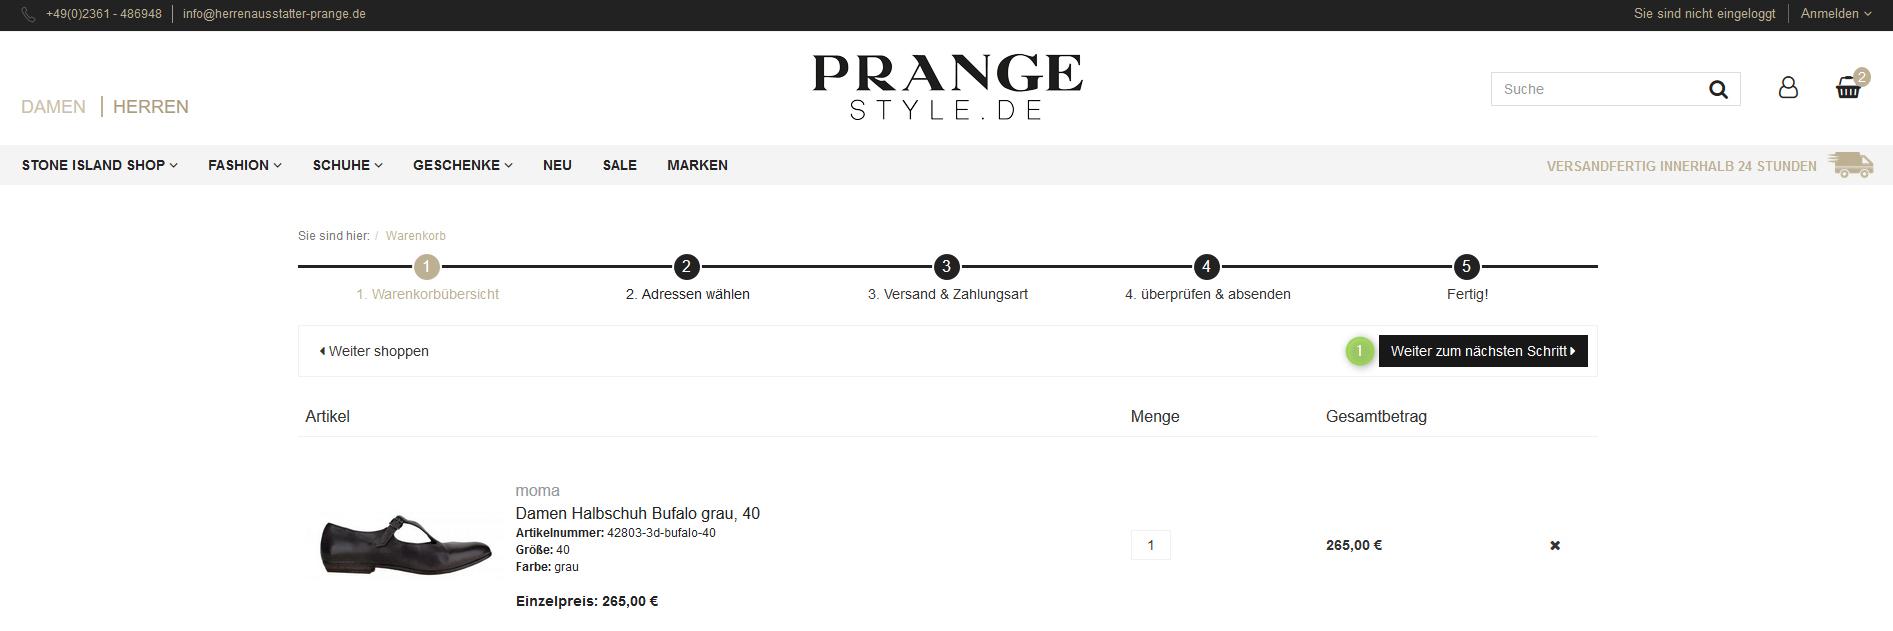 Artikel im Warenkorb bei Prange Style